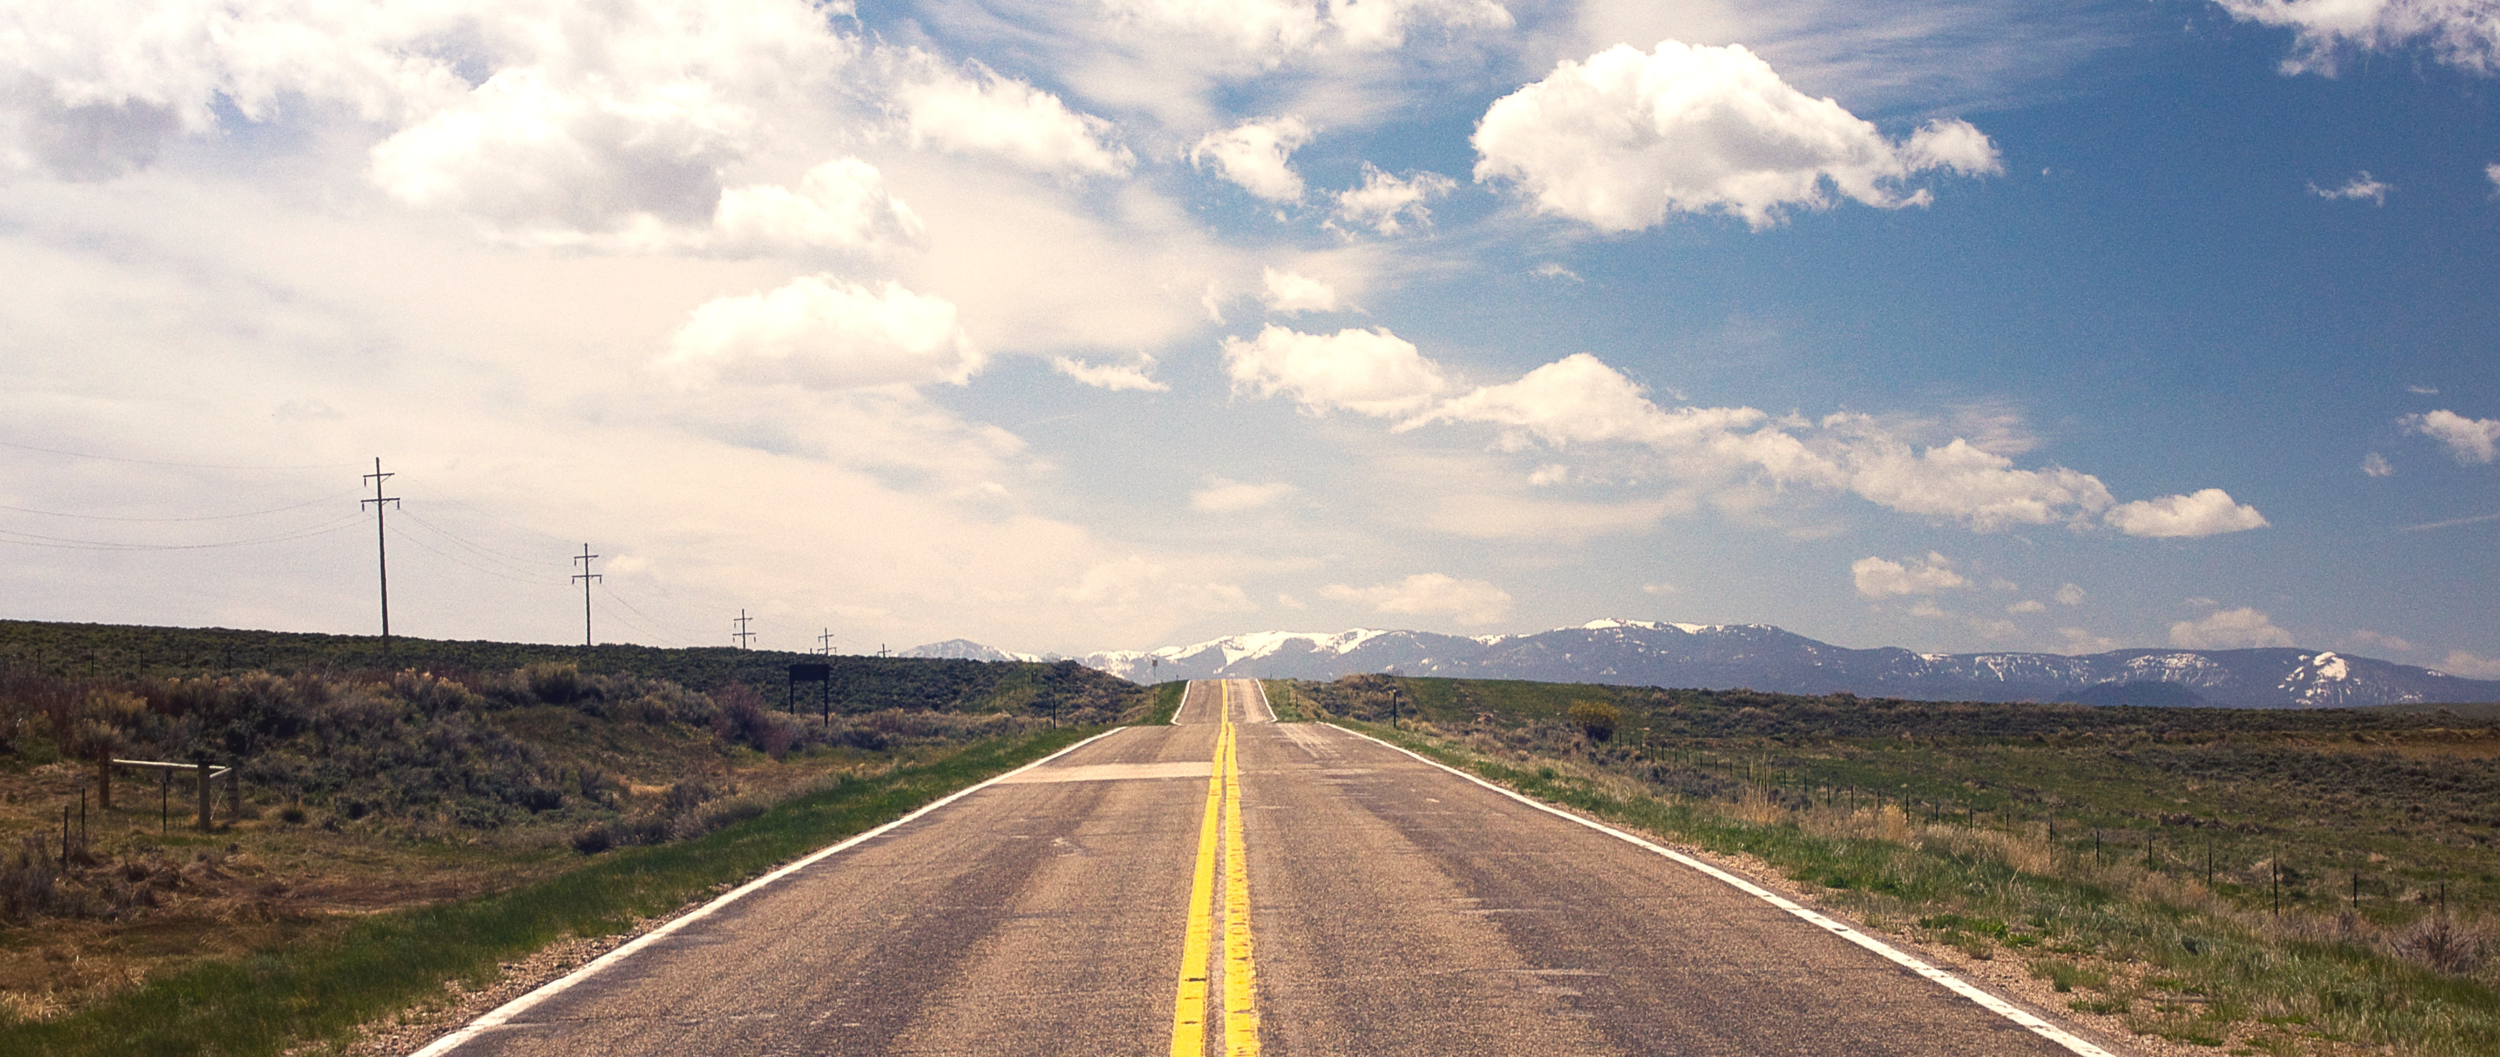 road_ahead.png